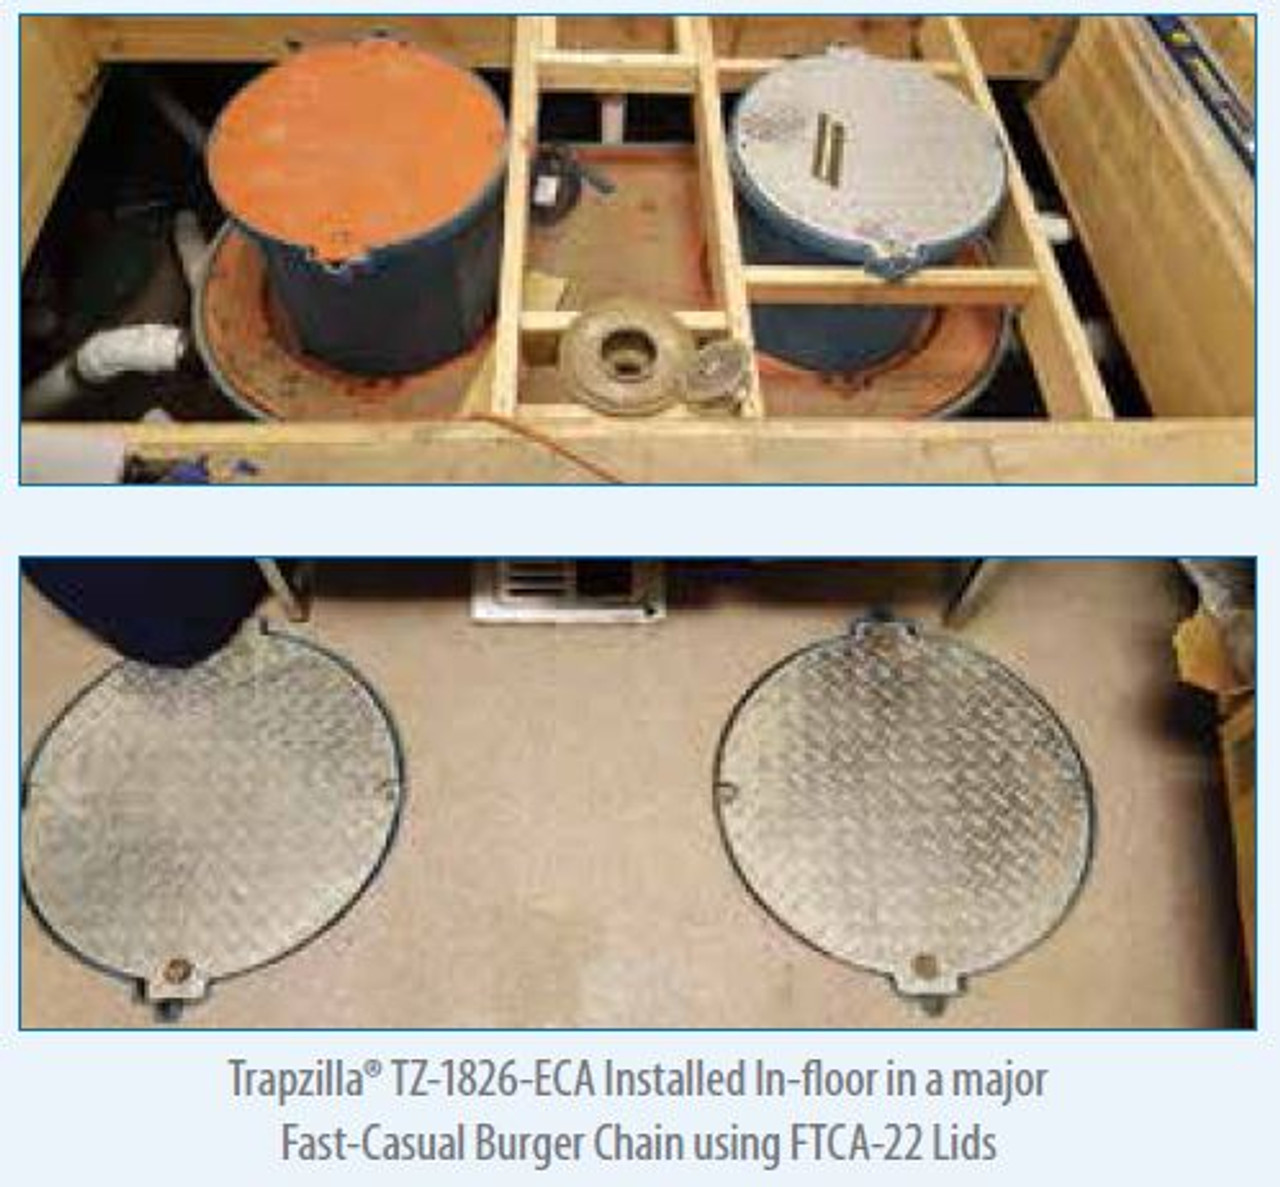 100 GPM Trapzilla Grease Interceptor, TZ-1826, 1,826 lbs Grease Capacity